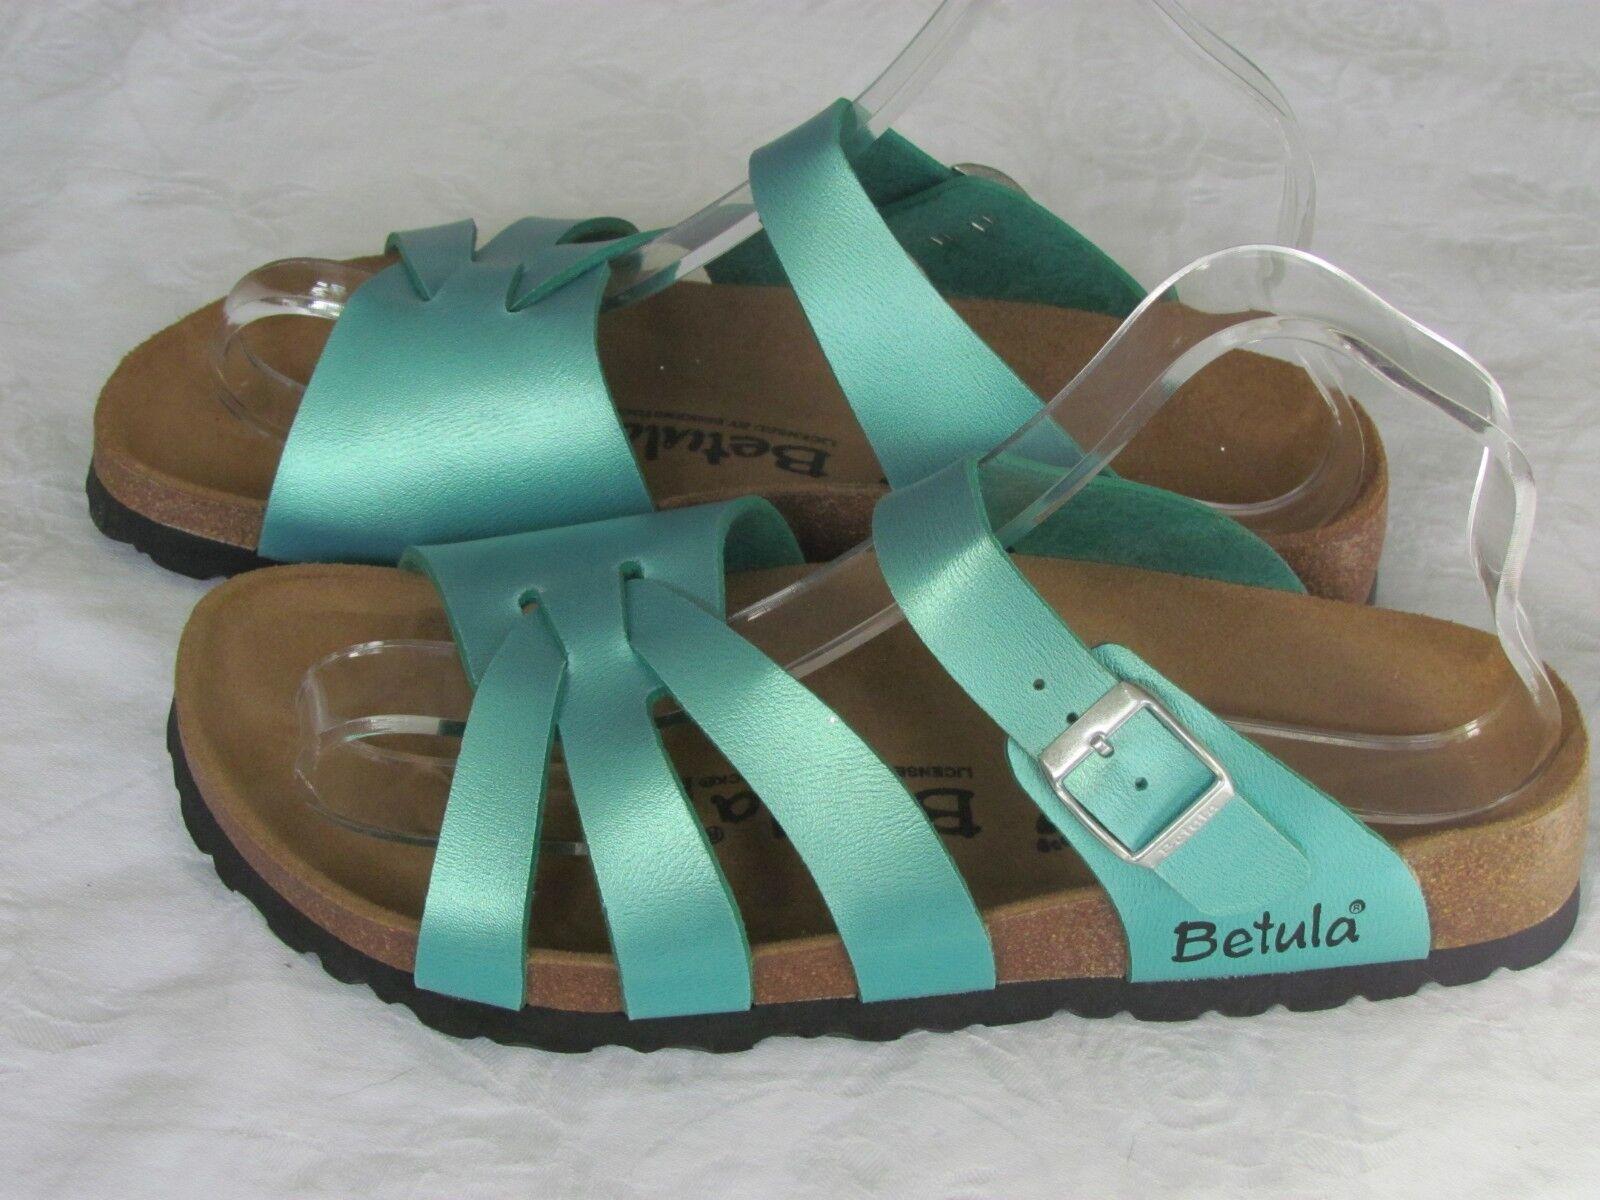 New Betula Ladies GORGEOUS  blu verde Shimmer Sandals  UK Dimensione 5.5 EU 39  ordinare on-line